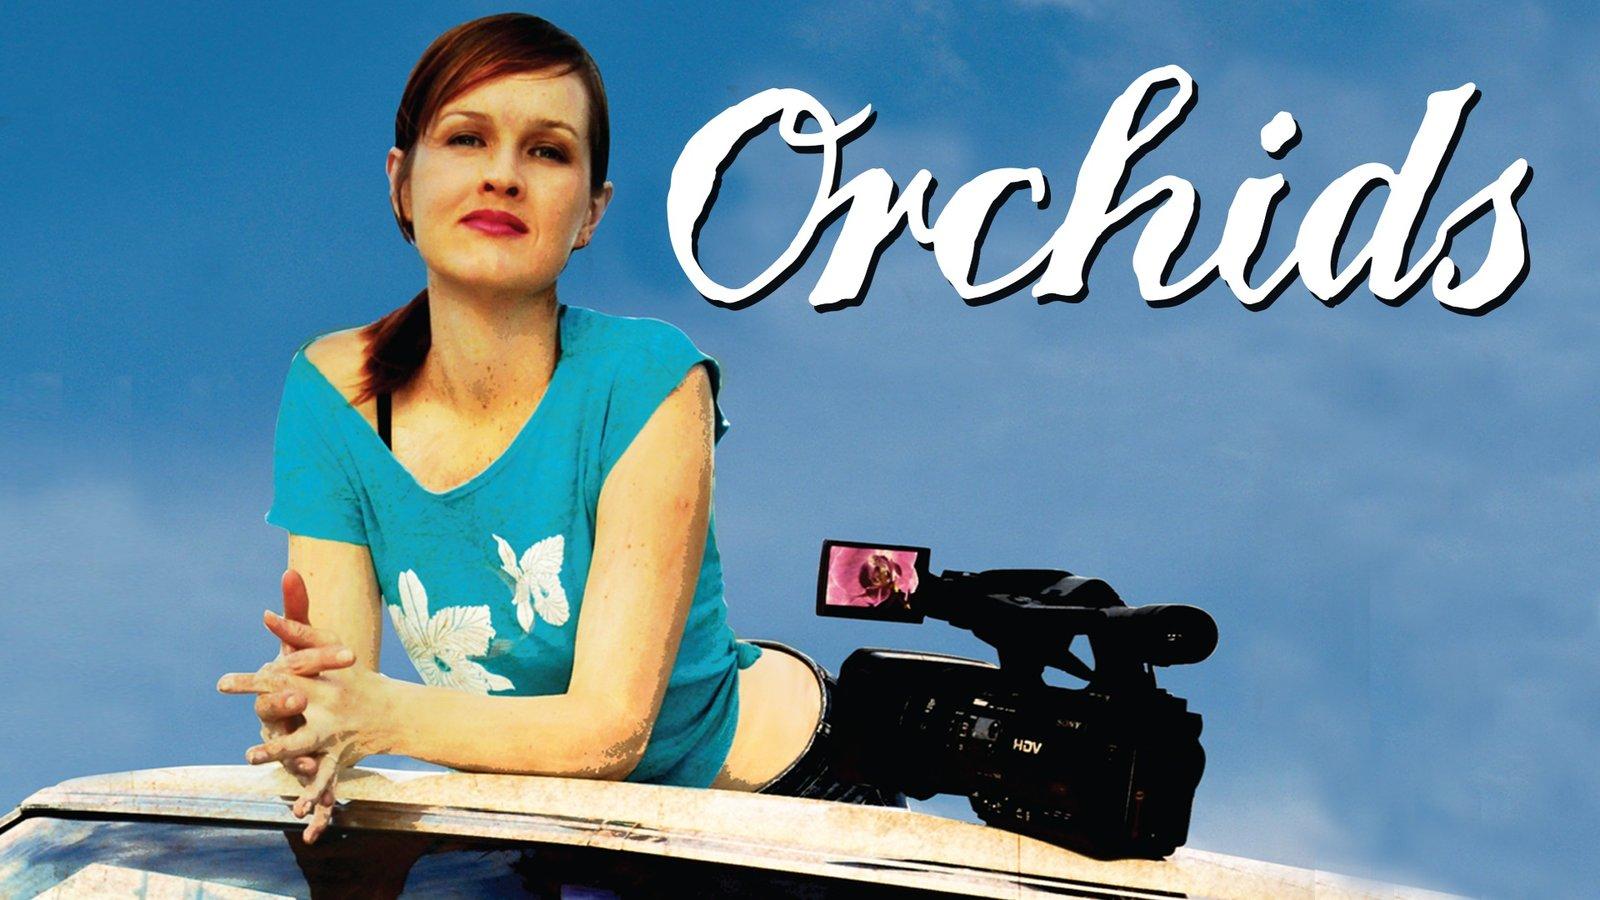 Orchids - My Intersex Adventure